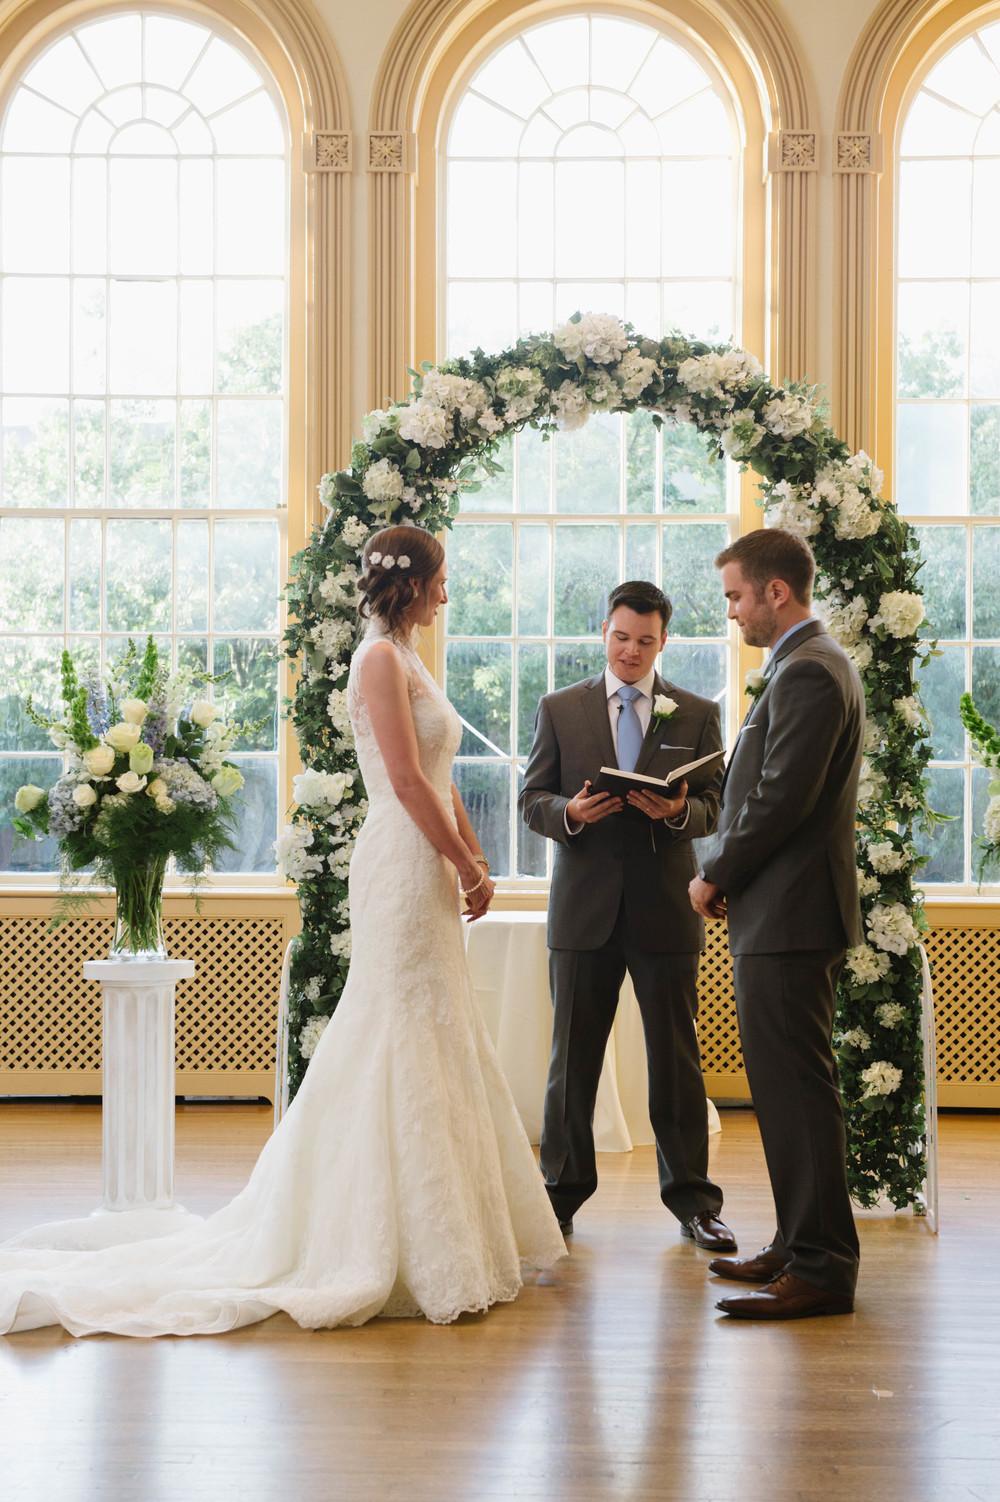 Salem_Massachusetts_Wedding016.jpg